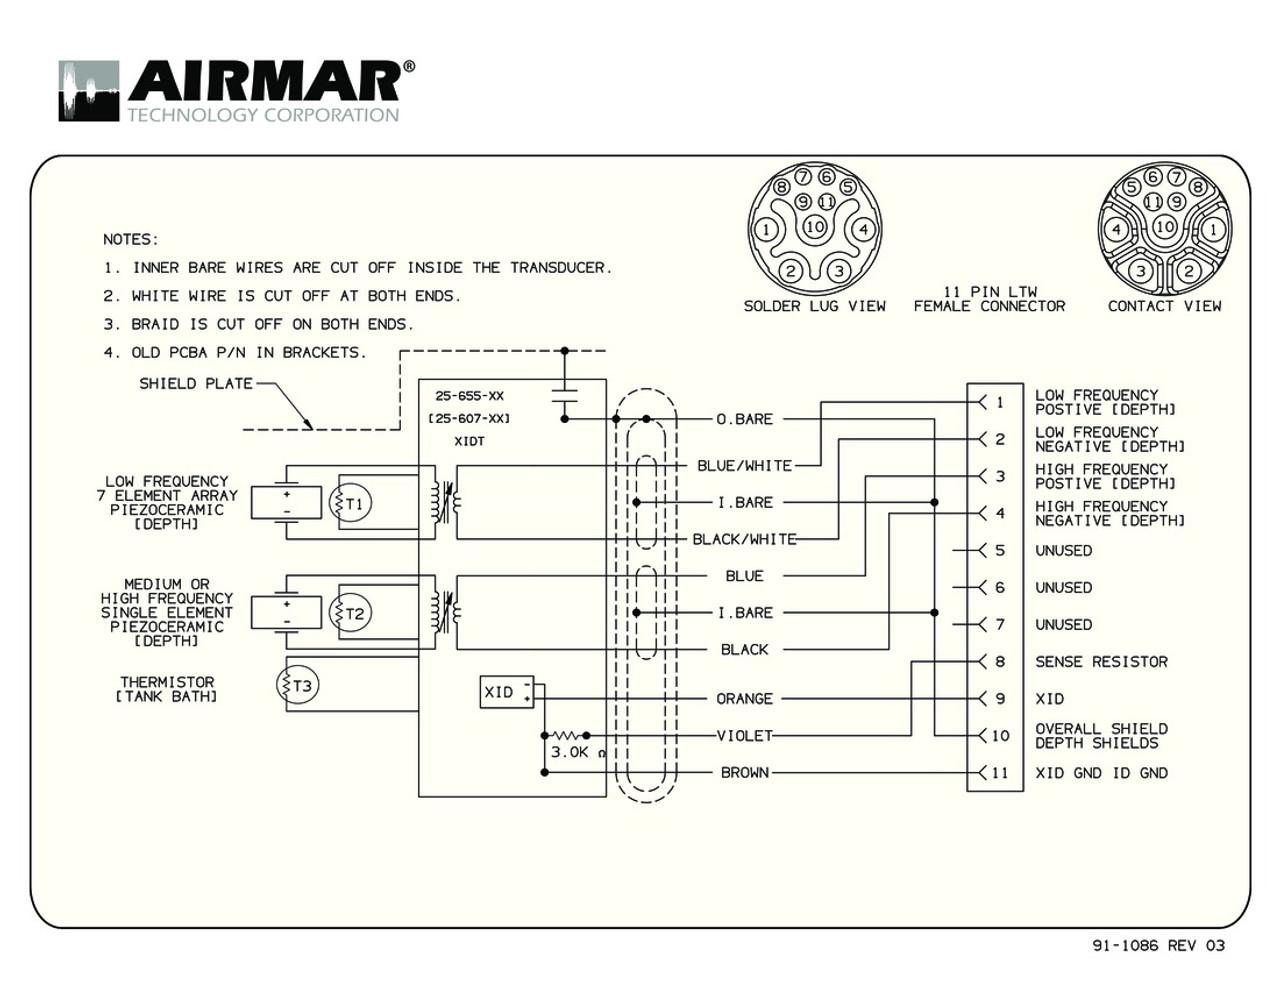 humminbird transducer wiring diagram humminbird. Black Bedroom Furniture Sets. Home Design Ideas